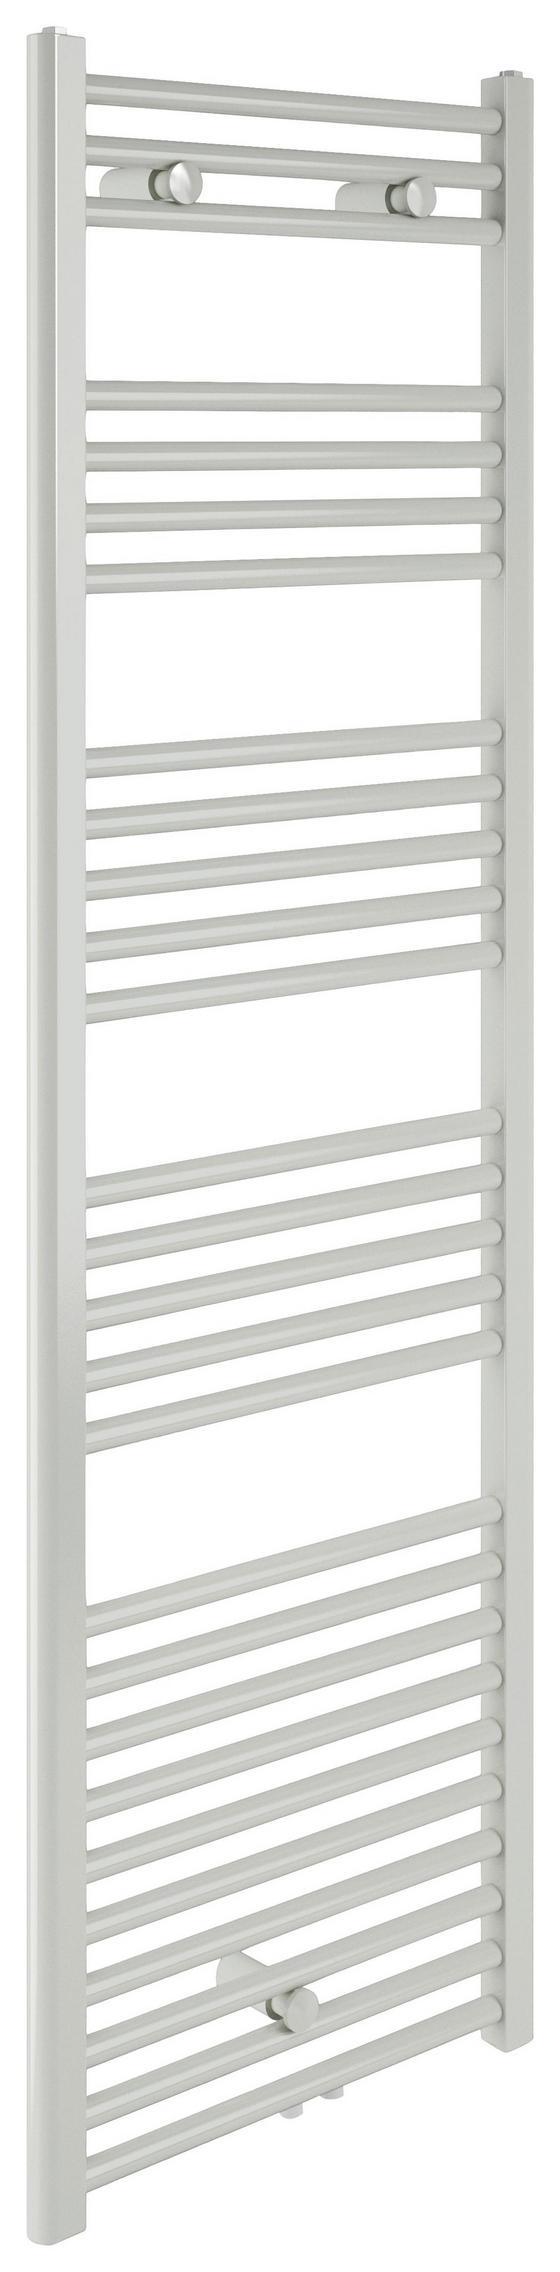 Badheizkörper Bari Gerade,600x1600mm - Weiß, Metall (60/160/12cm)